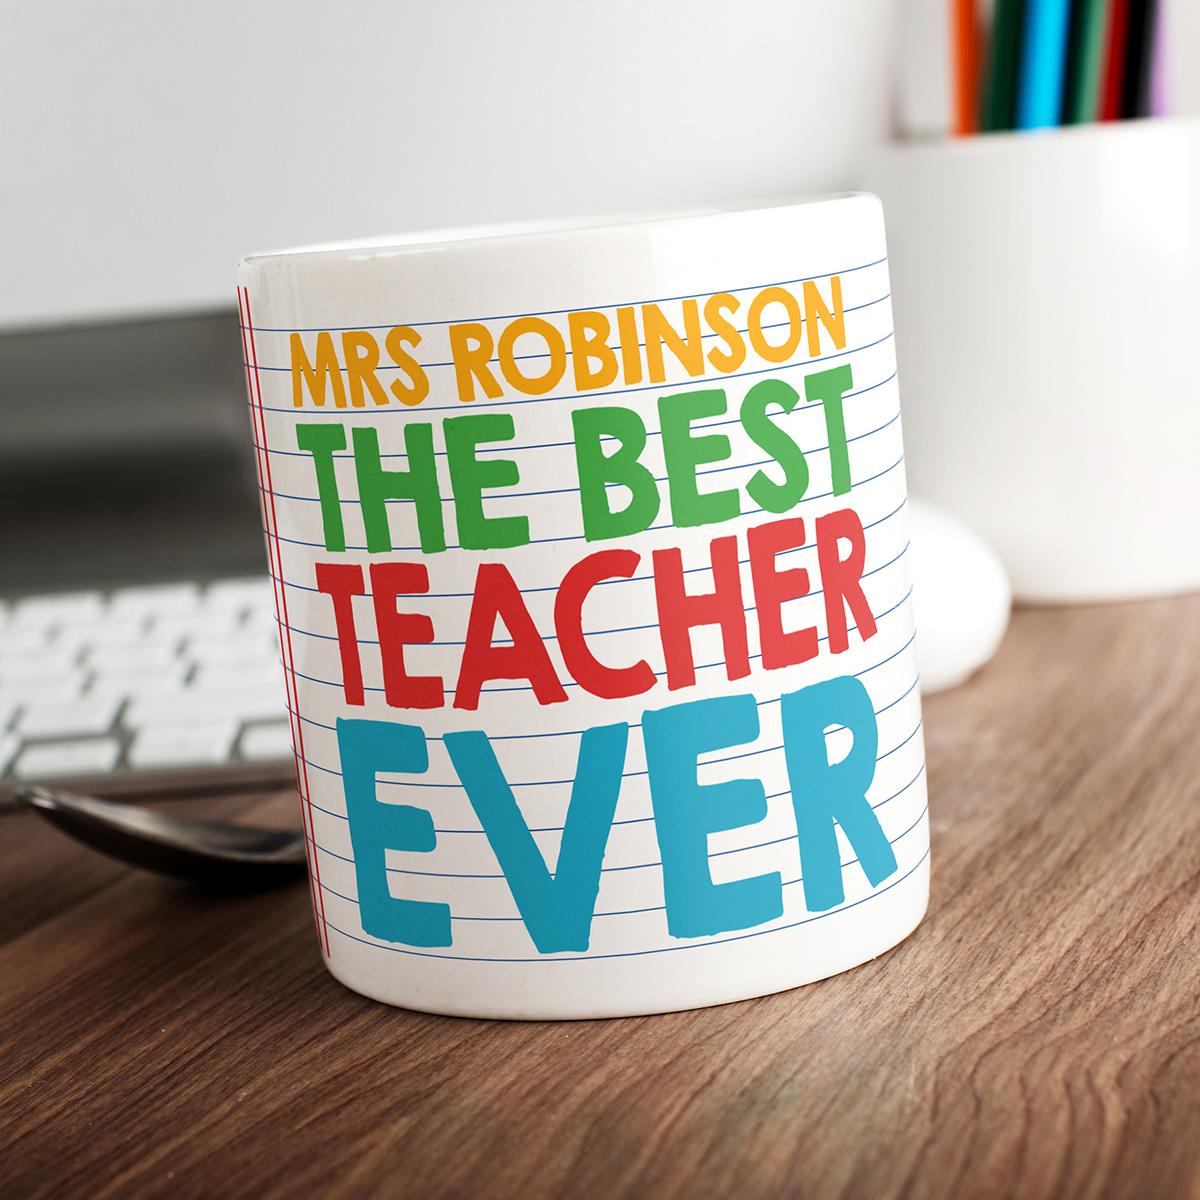 Personalised Mug - Best Teacher Ever